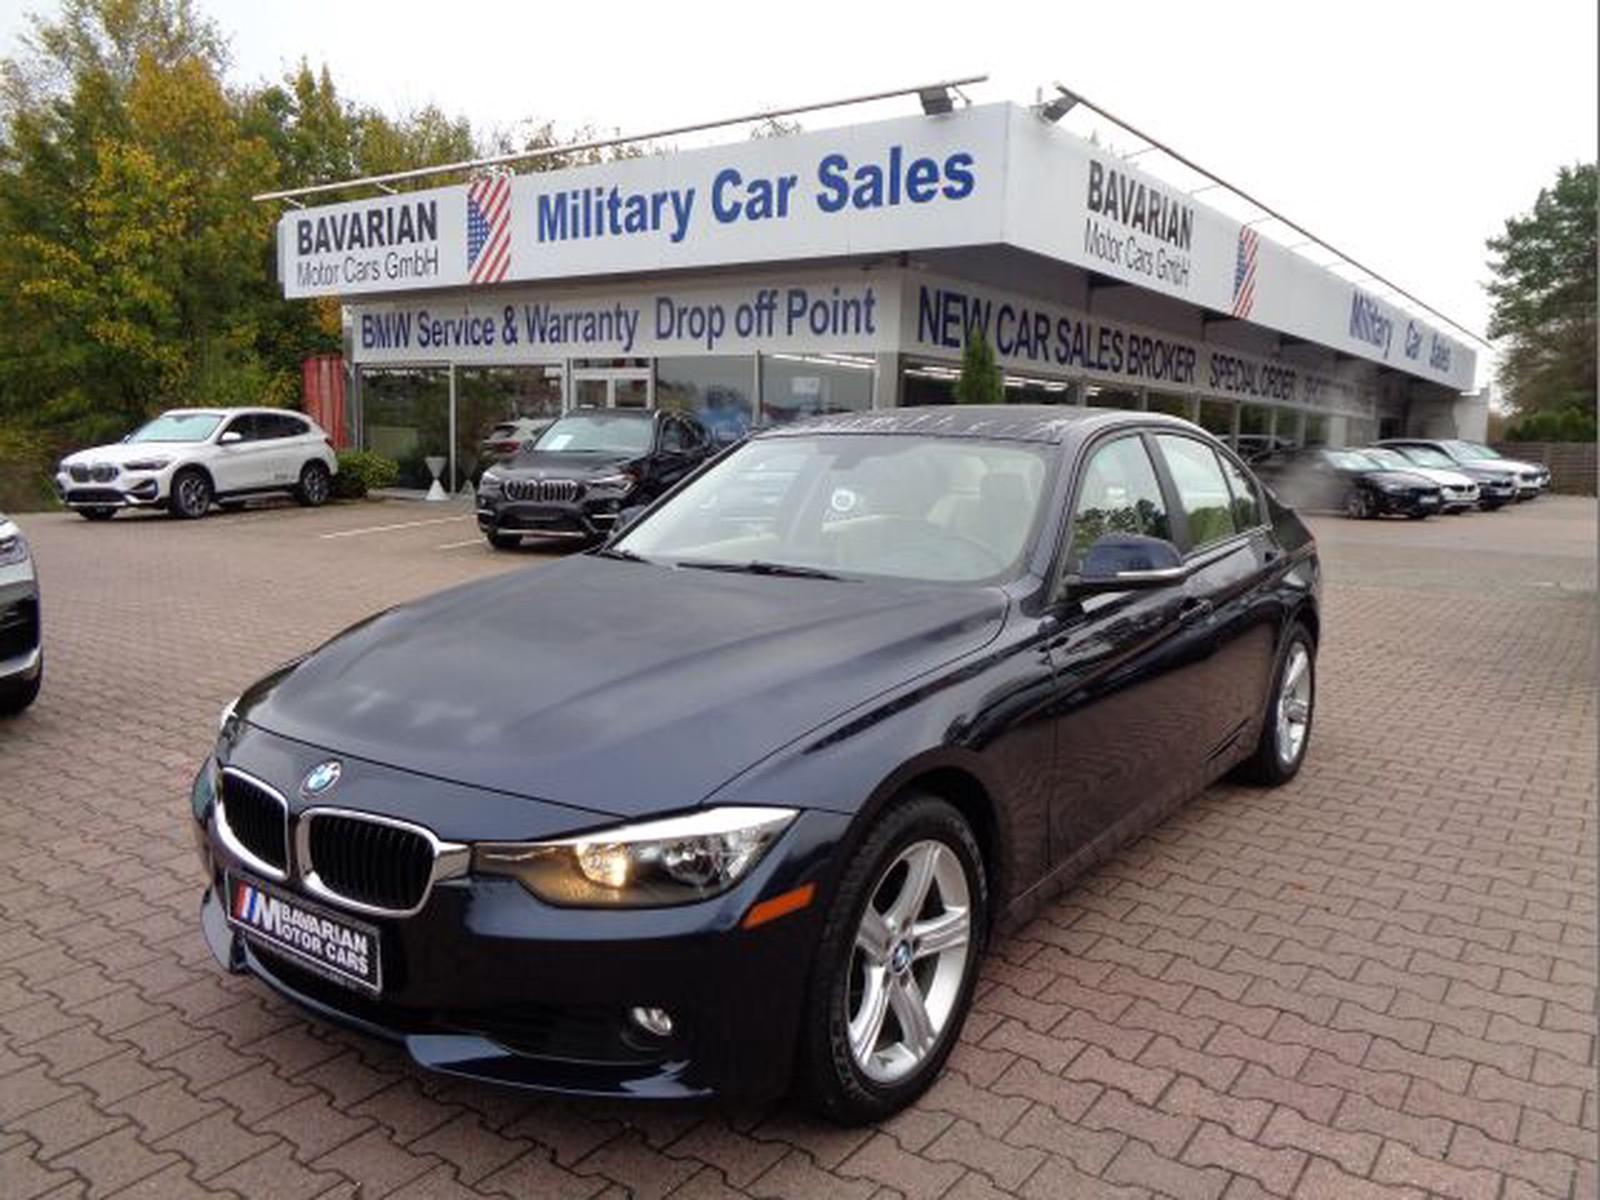 Bmw 328 I Xdrive Tax Free Military Sales In Kaiserslautern Price 17995 Usd Int Nr U 16003 Sold